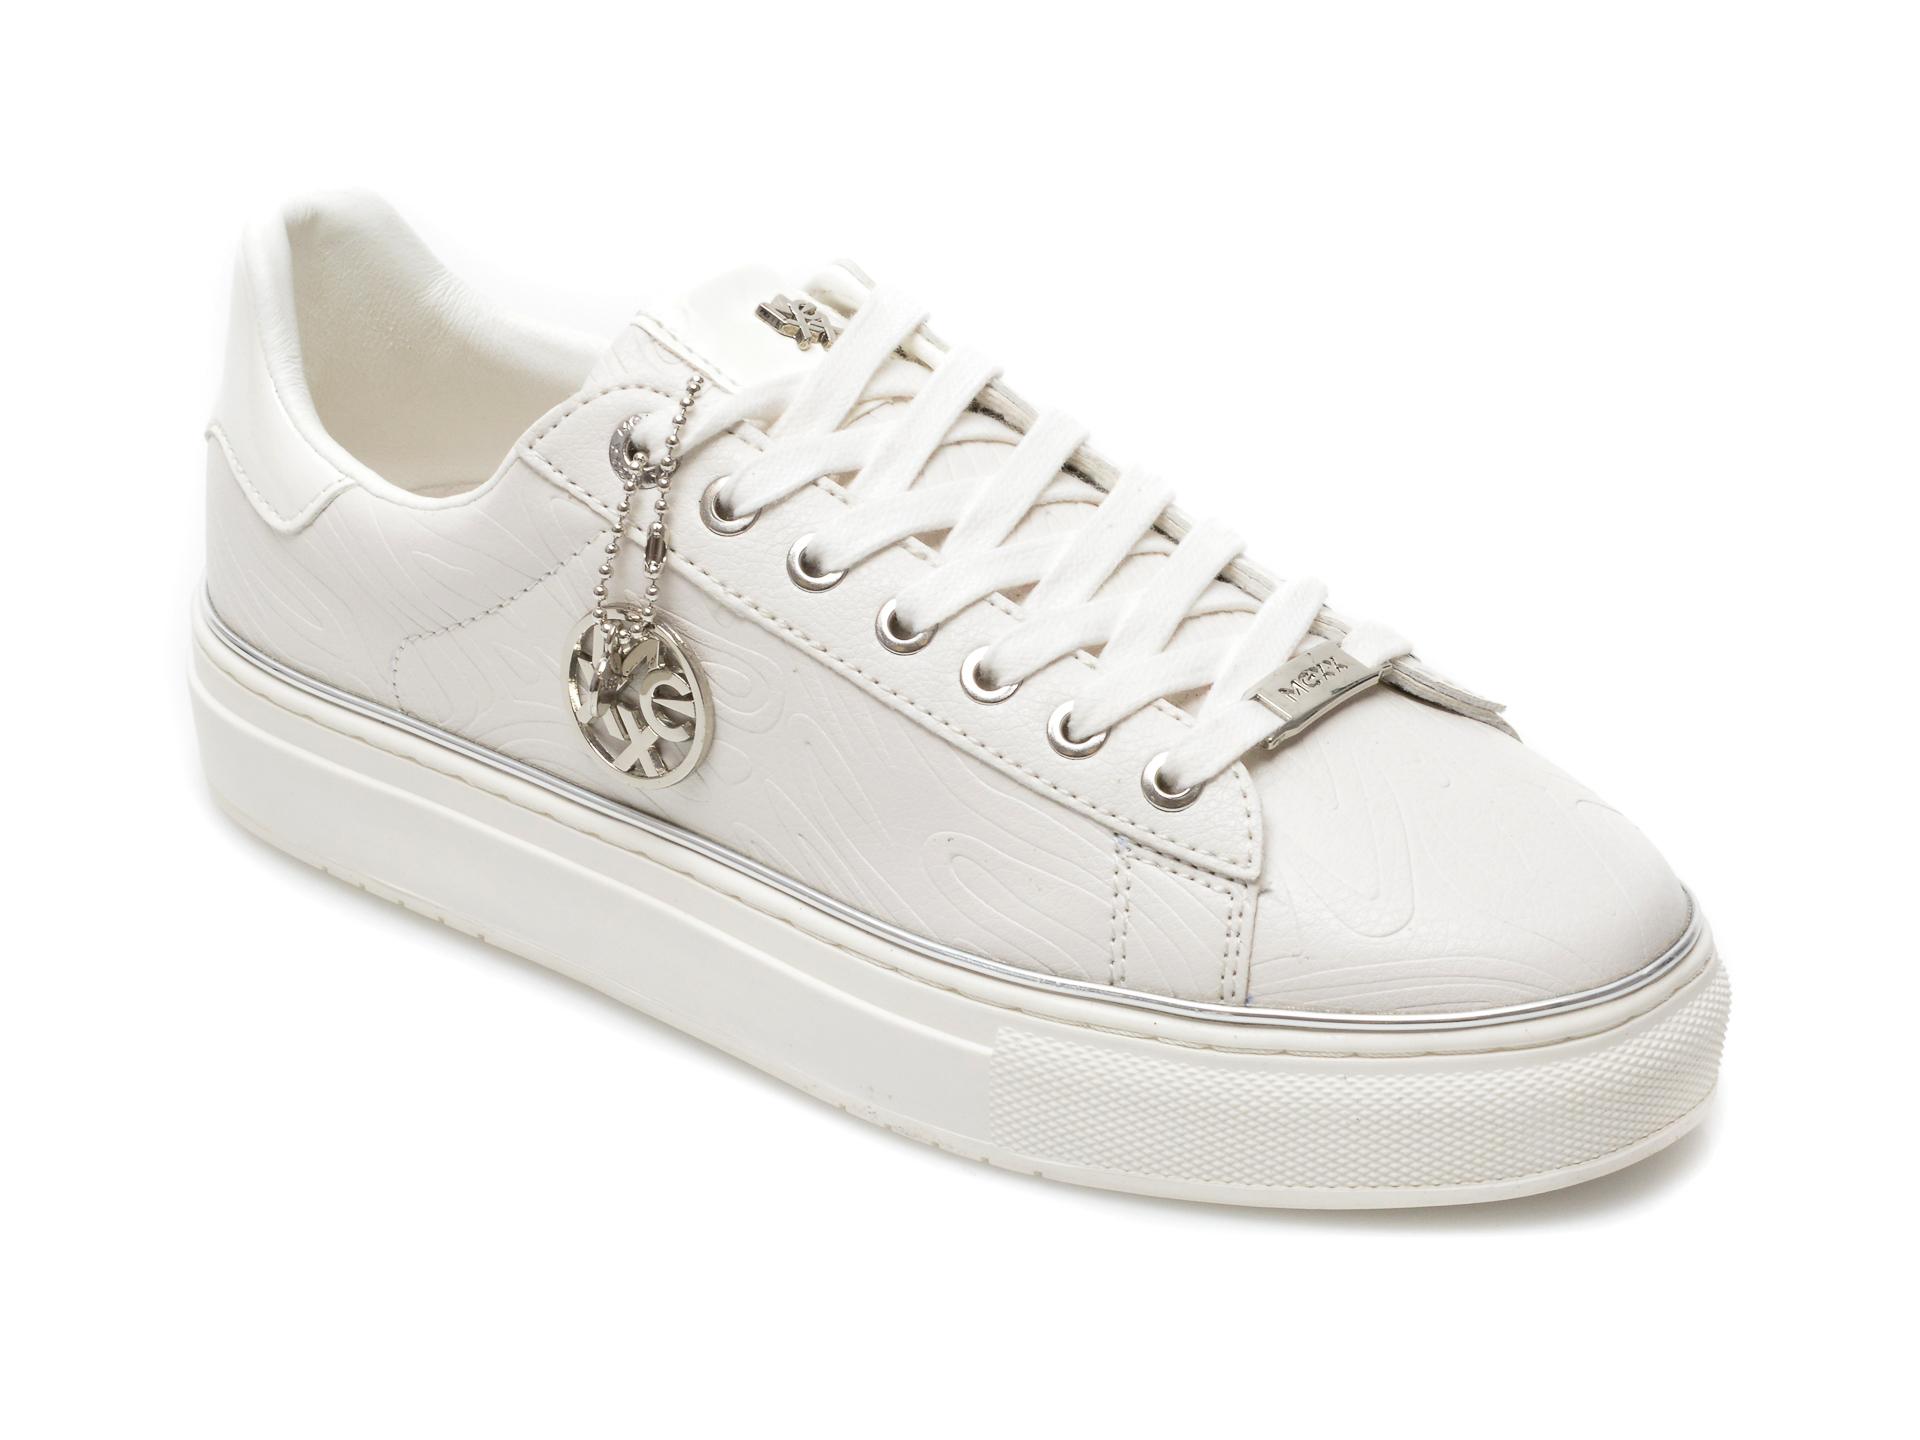 Pantofi sport MEXX albi, QP0319, din piele ecologica